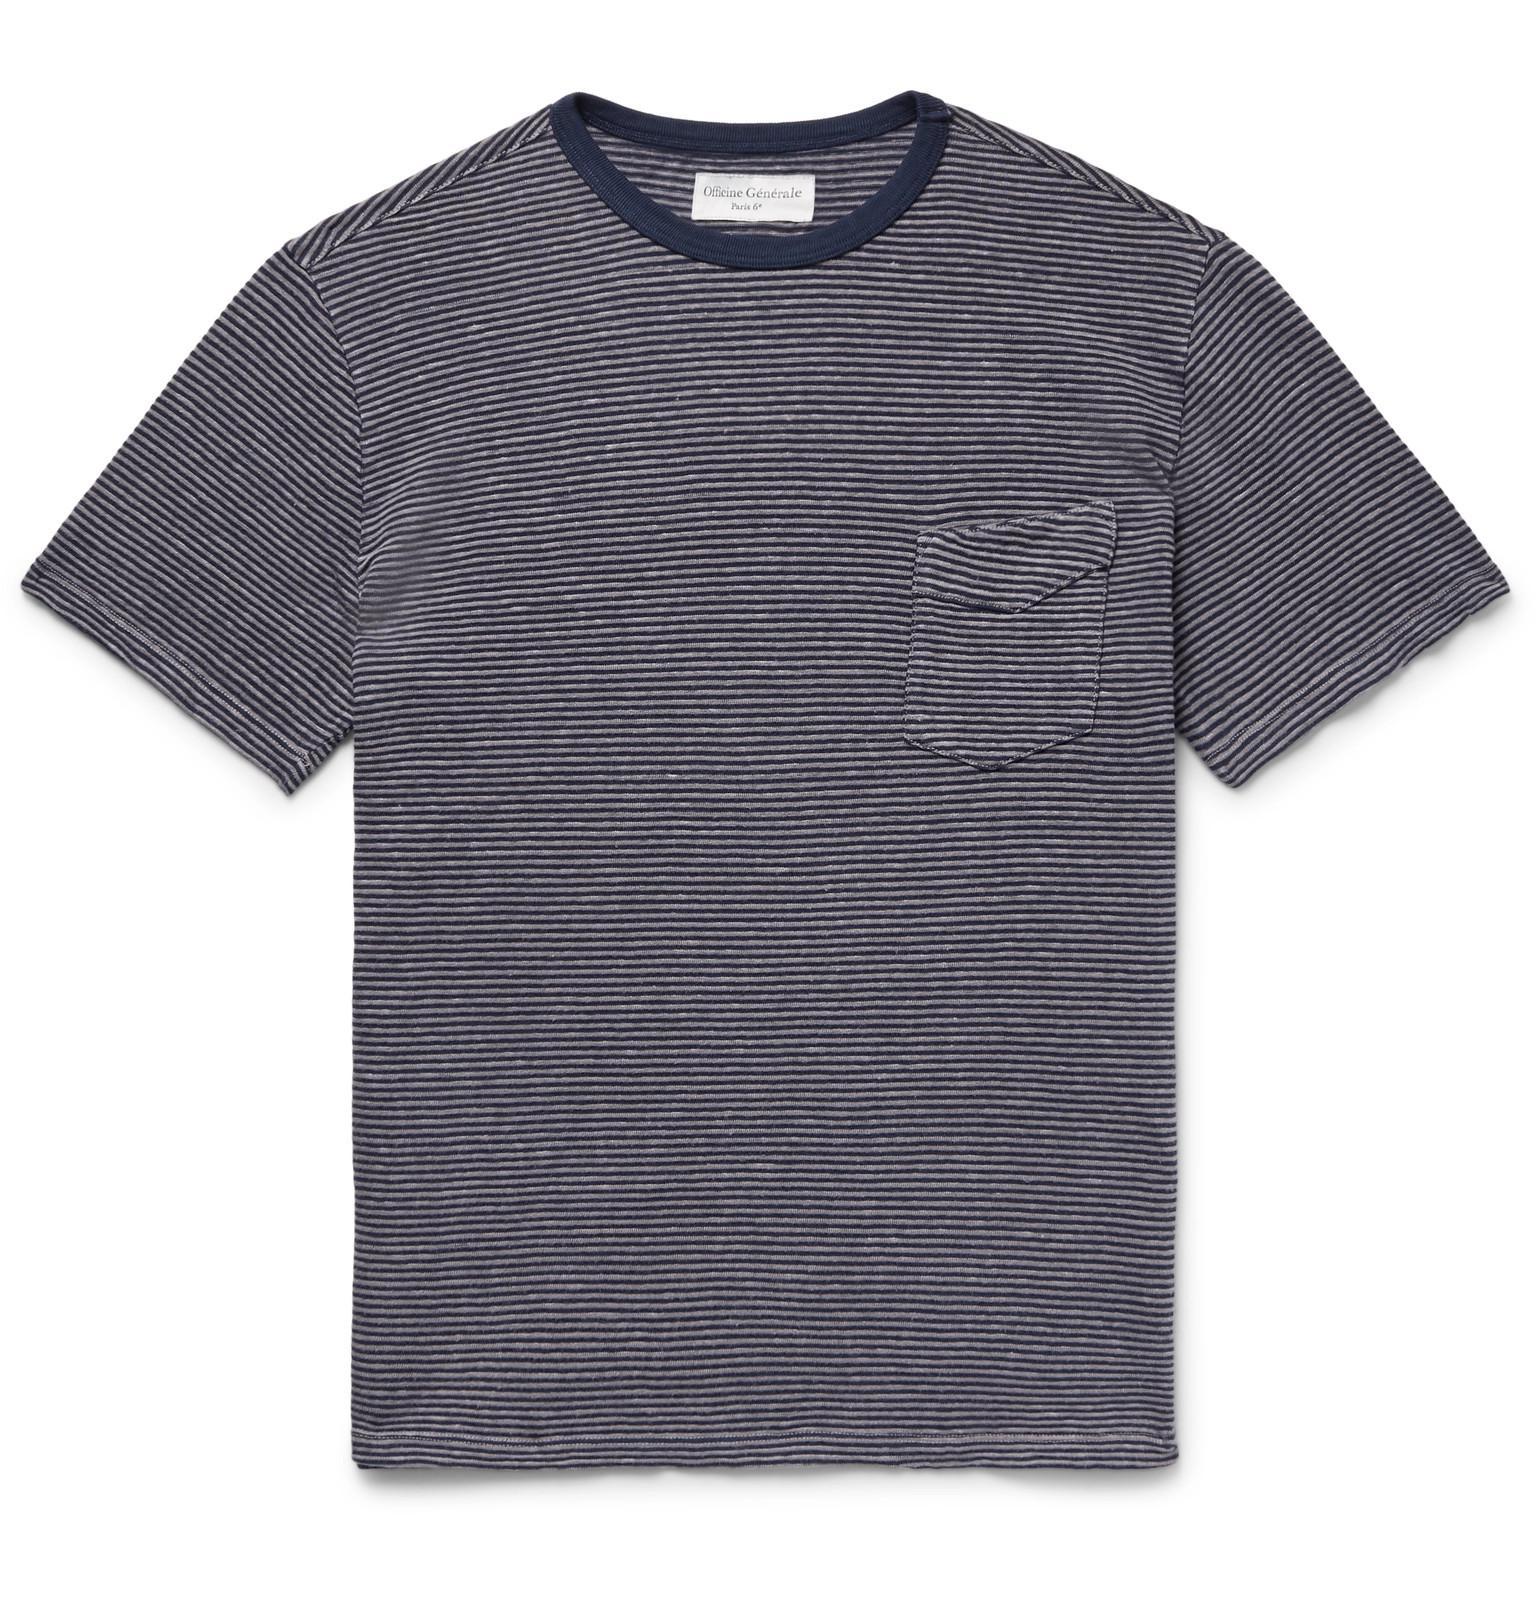 Officine Generale Garment-dyed Cotton-jersey T-shirt - Midnight blue Genuine 5HqbrIN